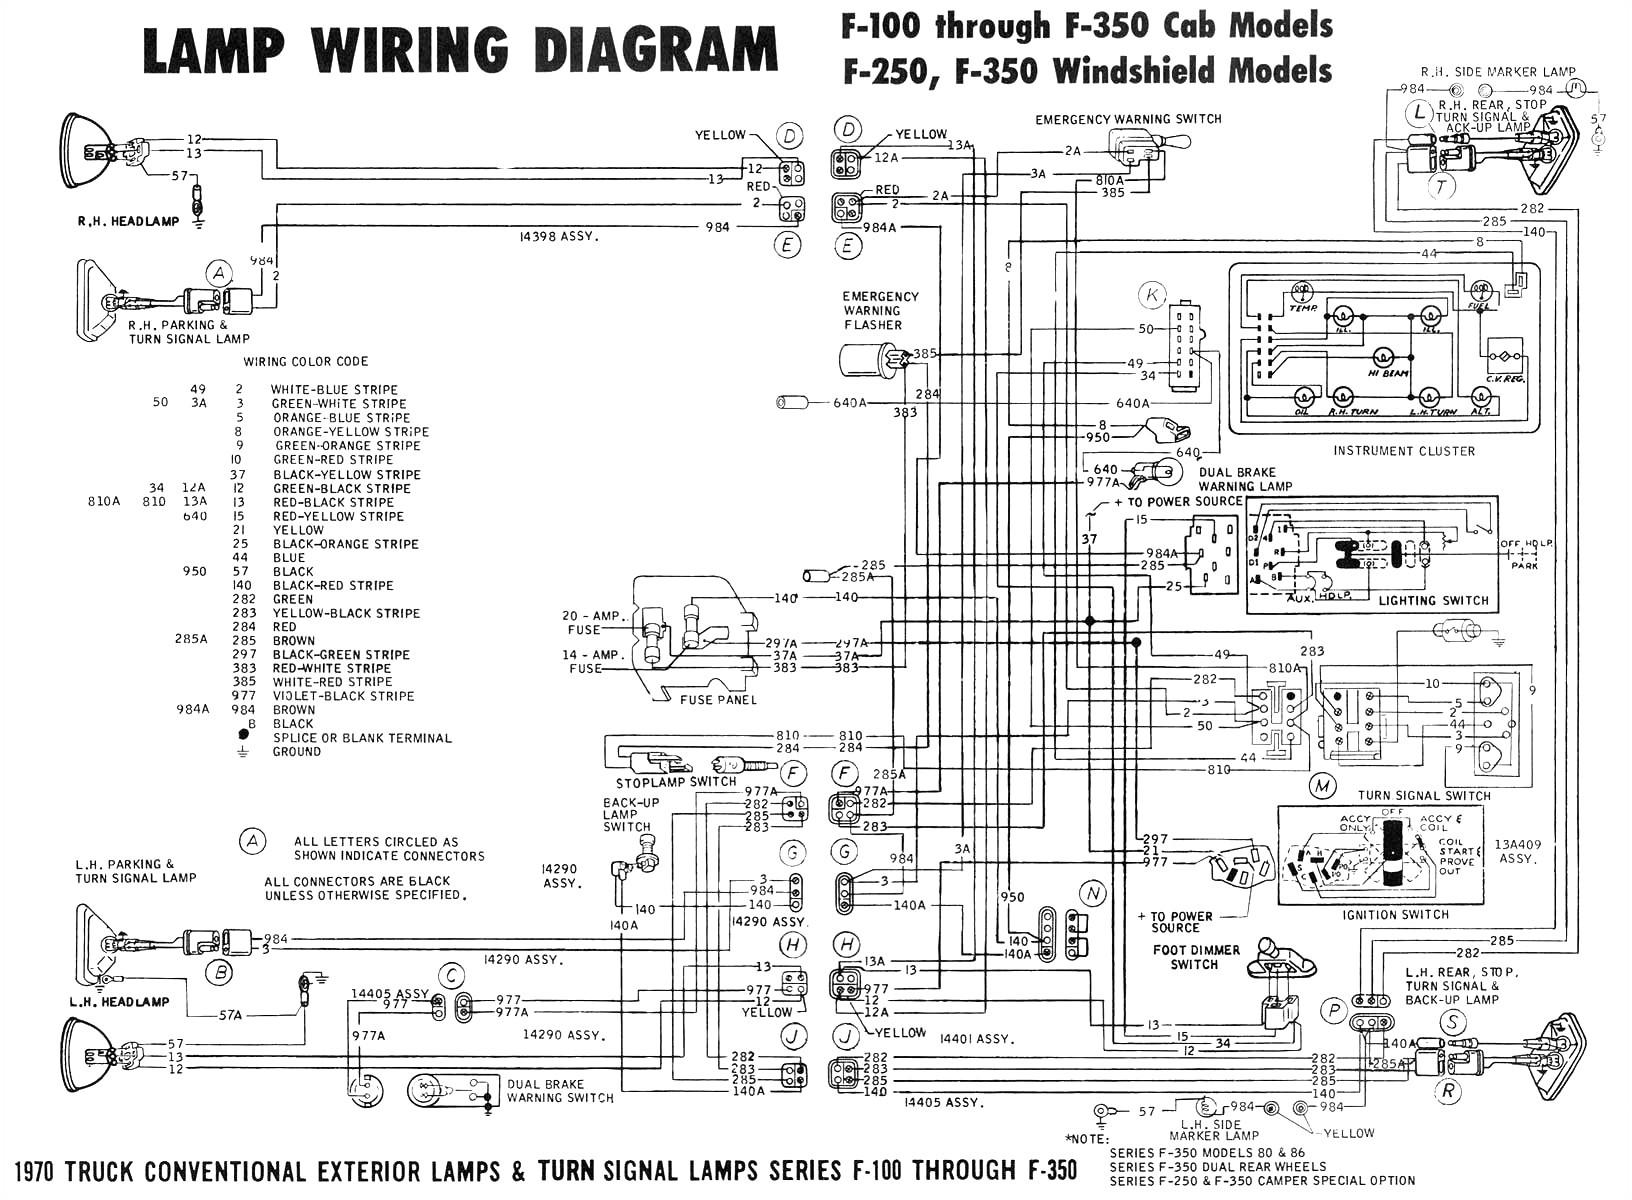 2002 ford e150 wiring diagram auto wiring diagram database ford wiring diagram 2011 explorer xlt ford wiring diagram 2002